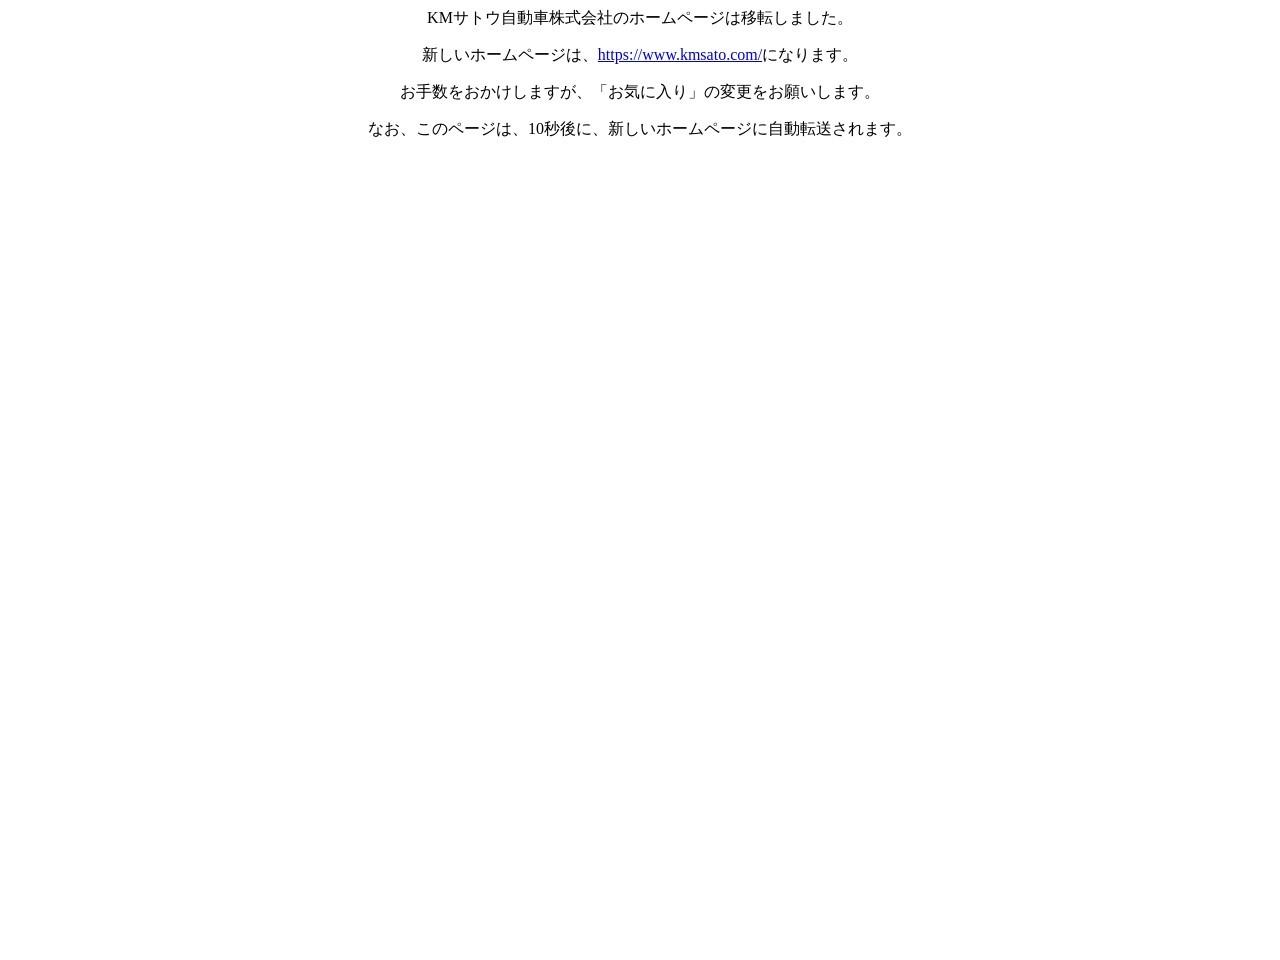 KMサトウ自動車株式会社